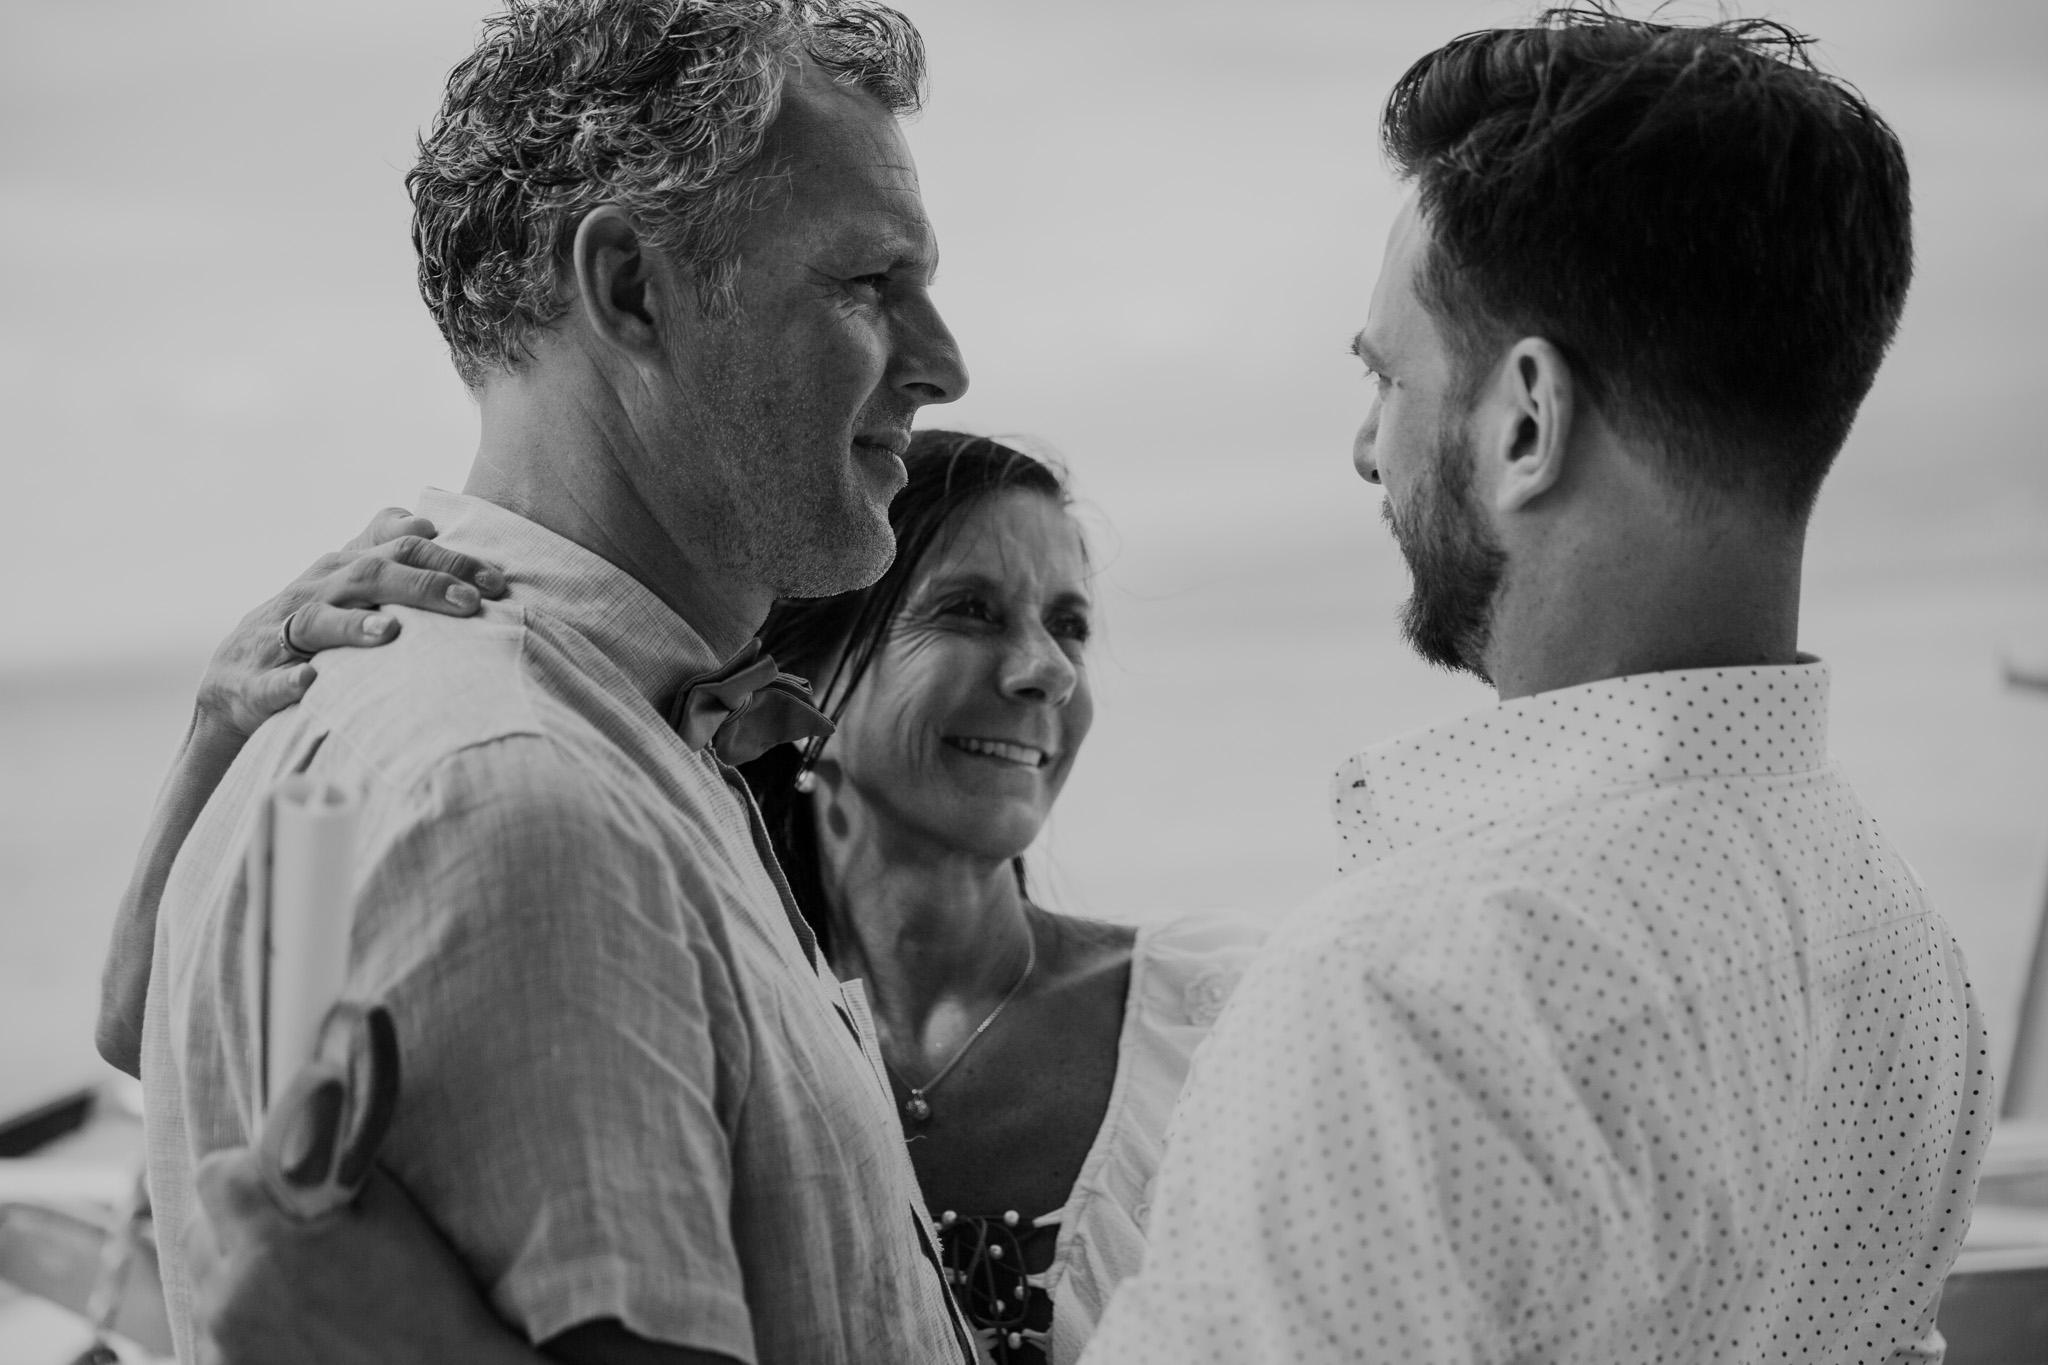 wedding-vow-renewal-hawaii-hochzeit-maui-silberhochzeit-karol-and-jens_155.jpg